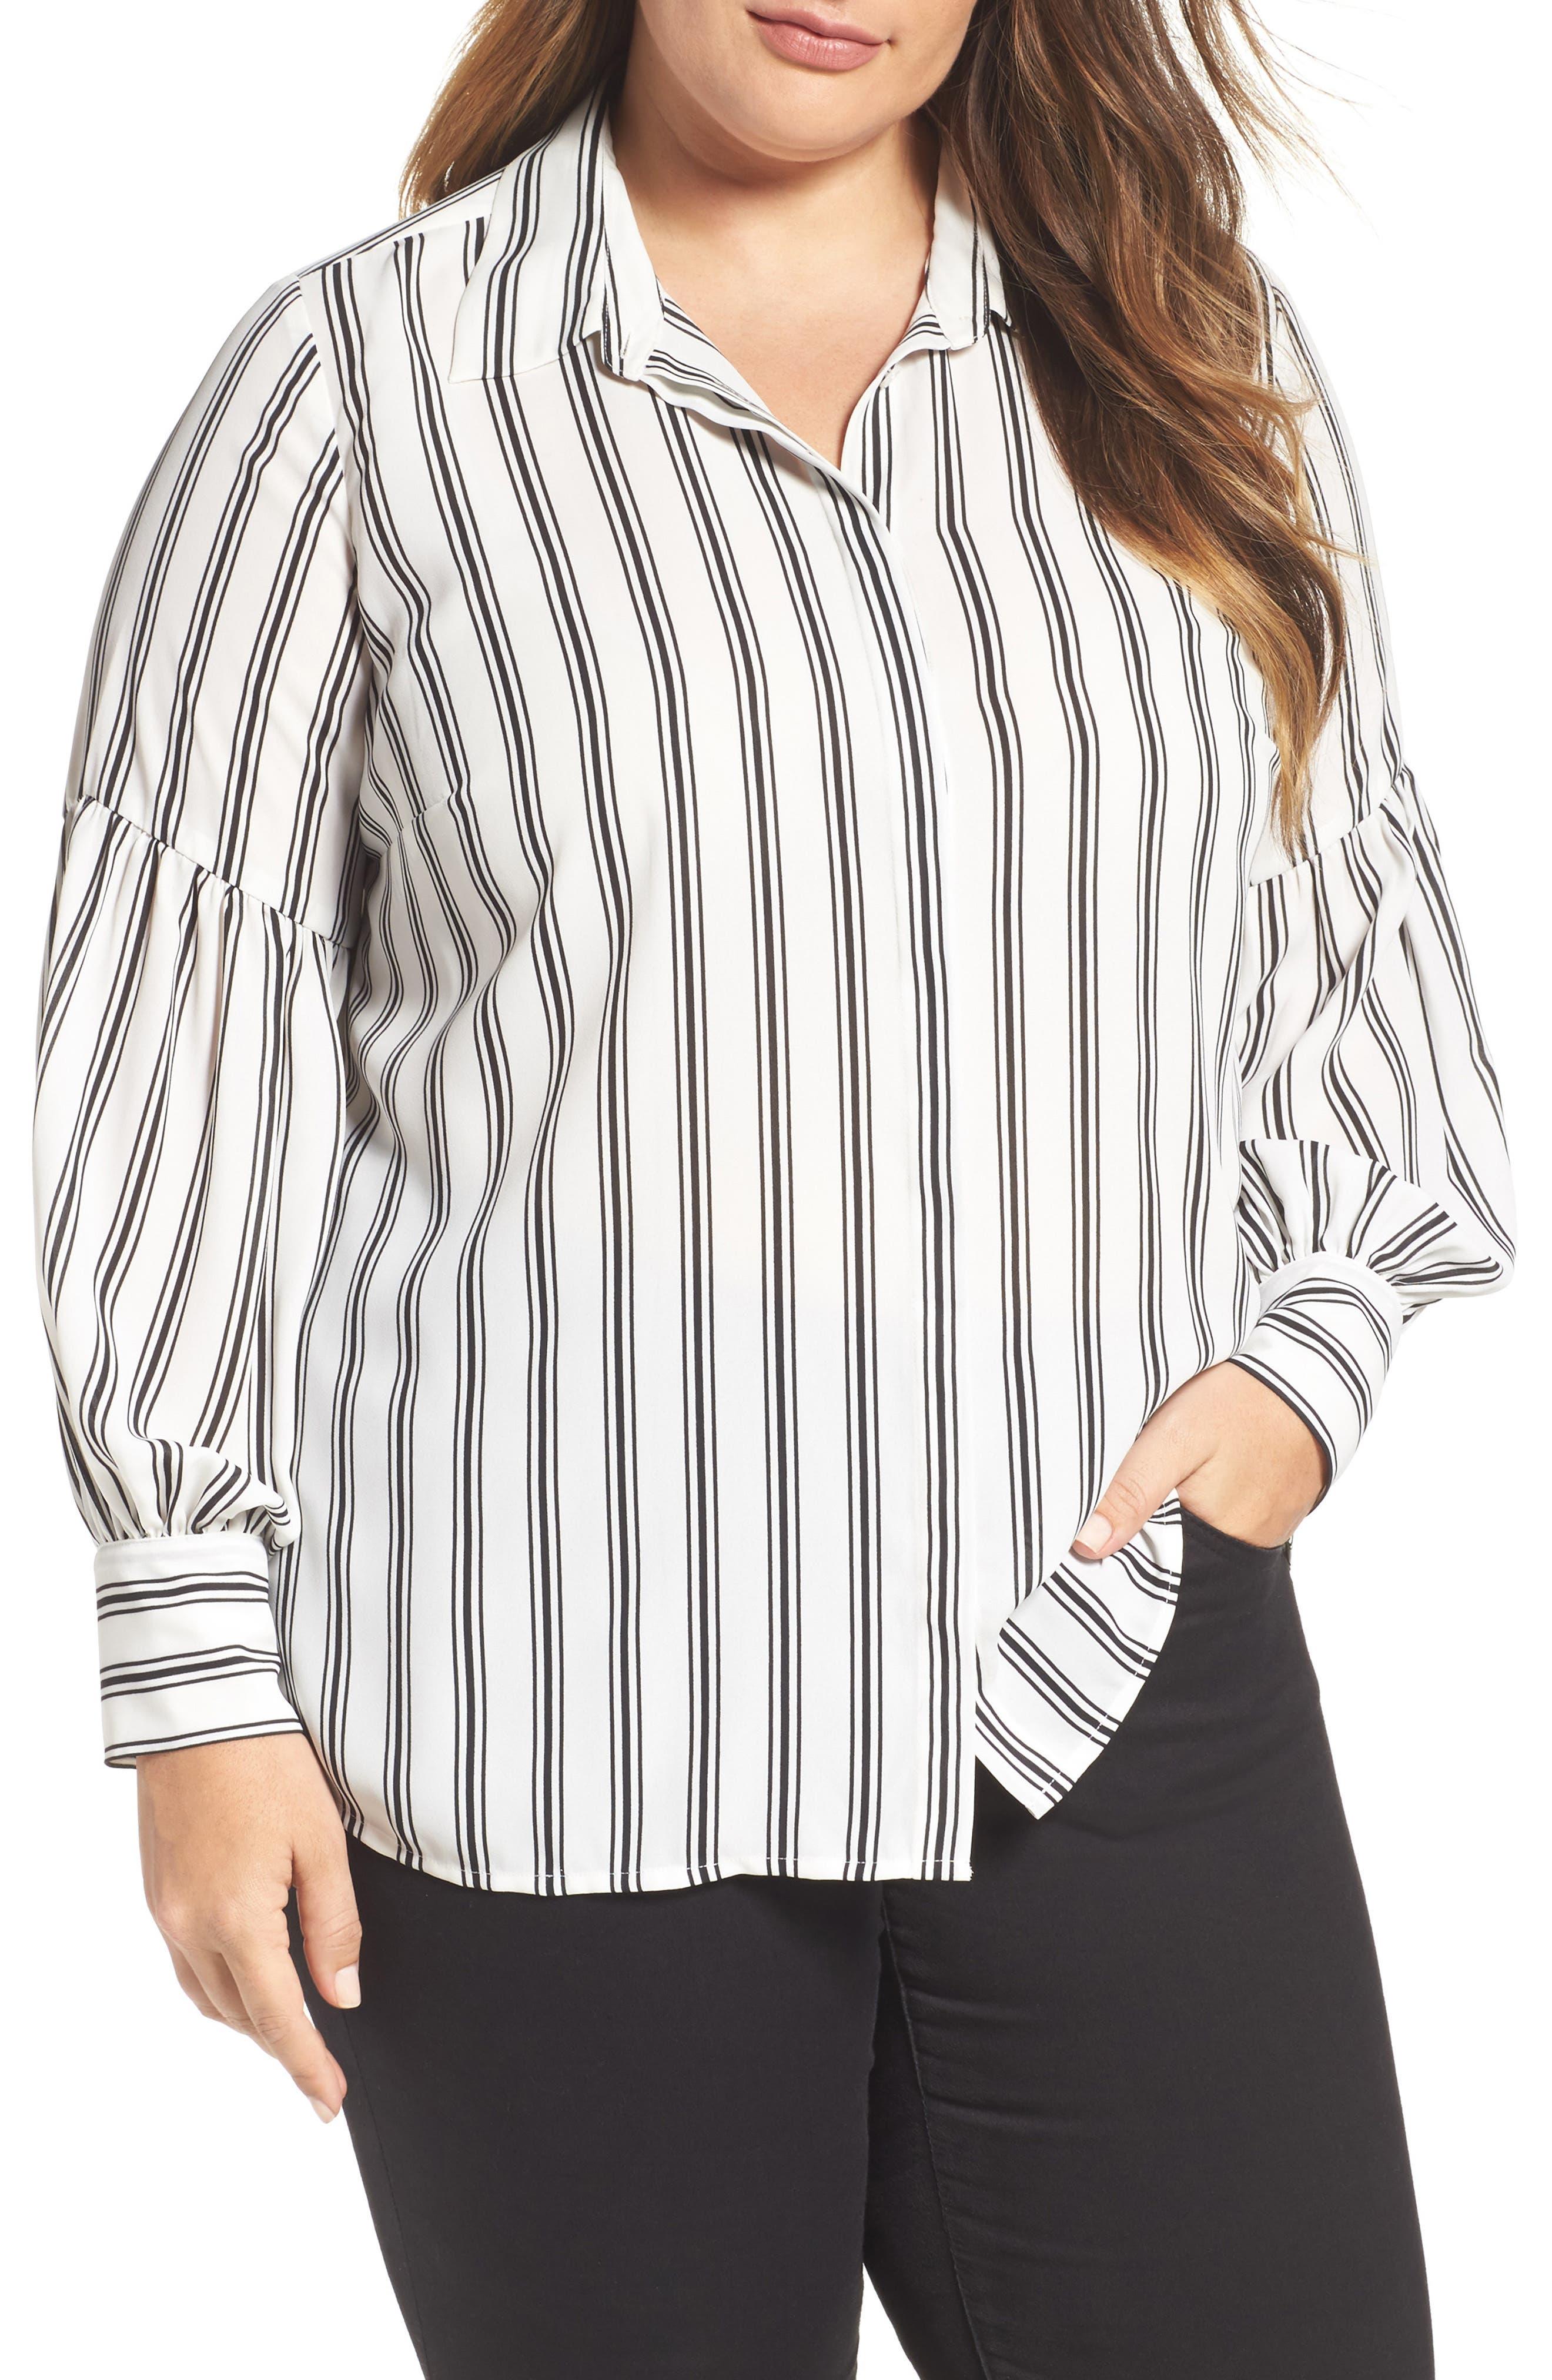 Stripe Puff Sleeve Blouse,                             Main thumbnail 1, color,                             901